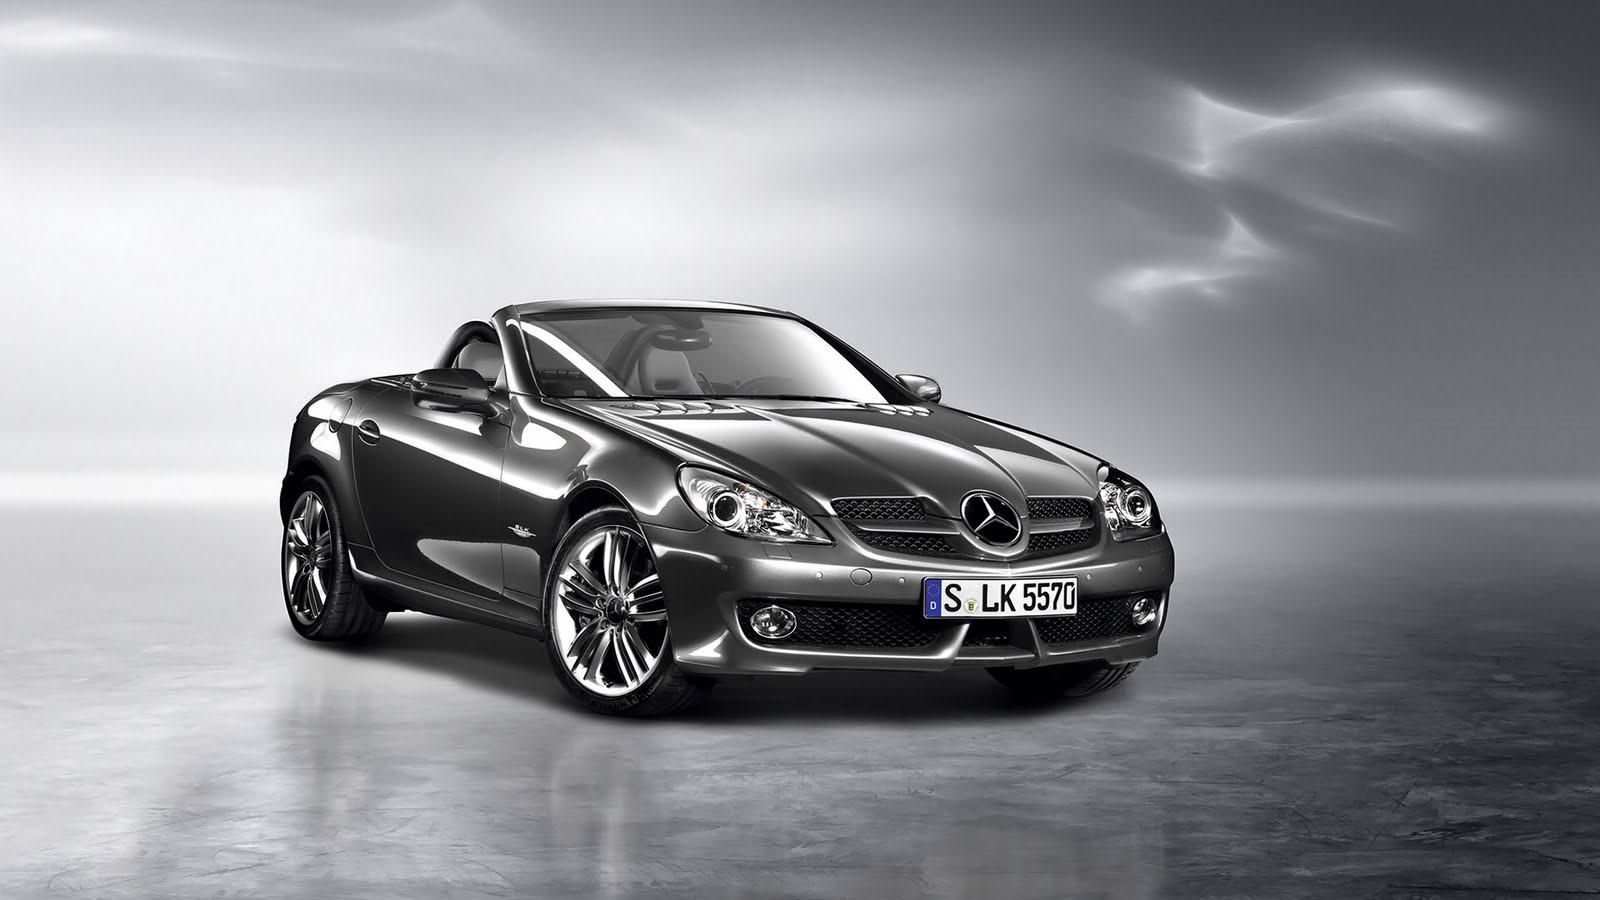 http://3.bp.blogspot.com/-YhgEwDlmSDI/TwrhkFzHZvI/AAAAAAAAAaA/__oT7oQwNiI/s1600/Mercedes-Benz+SLK-Class-Wallpaper.jpg